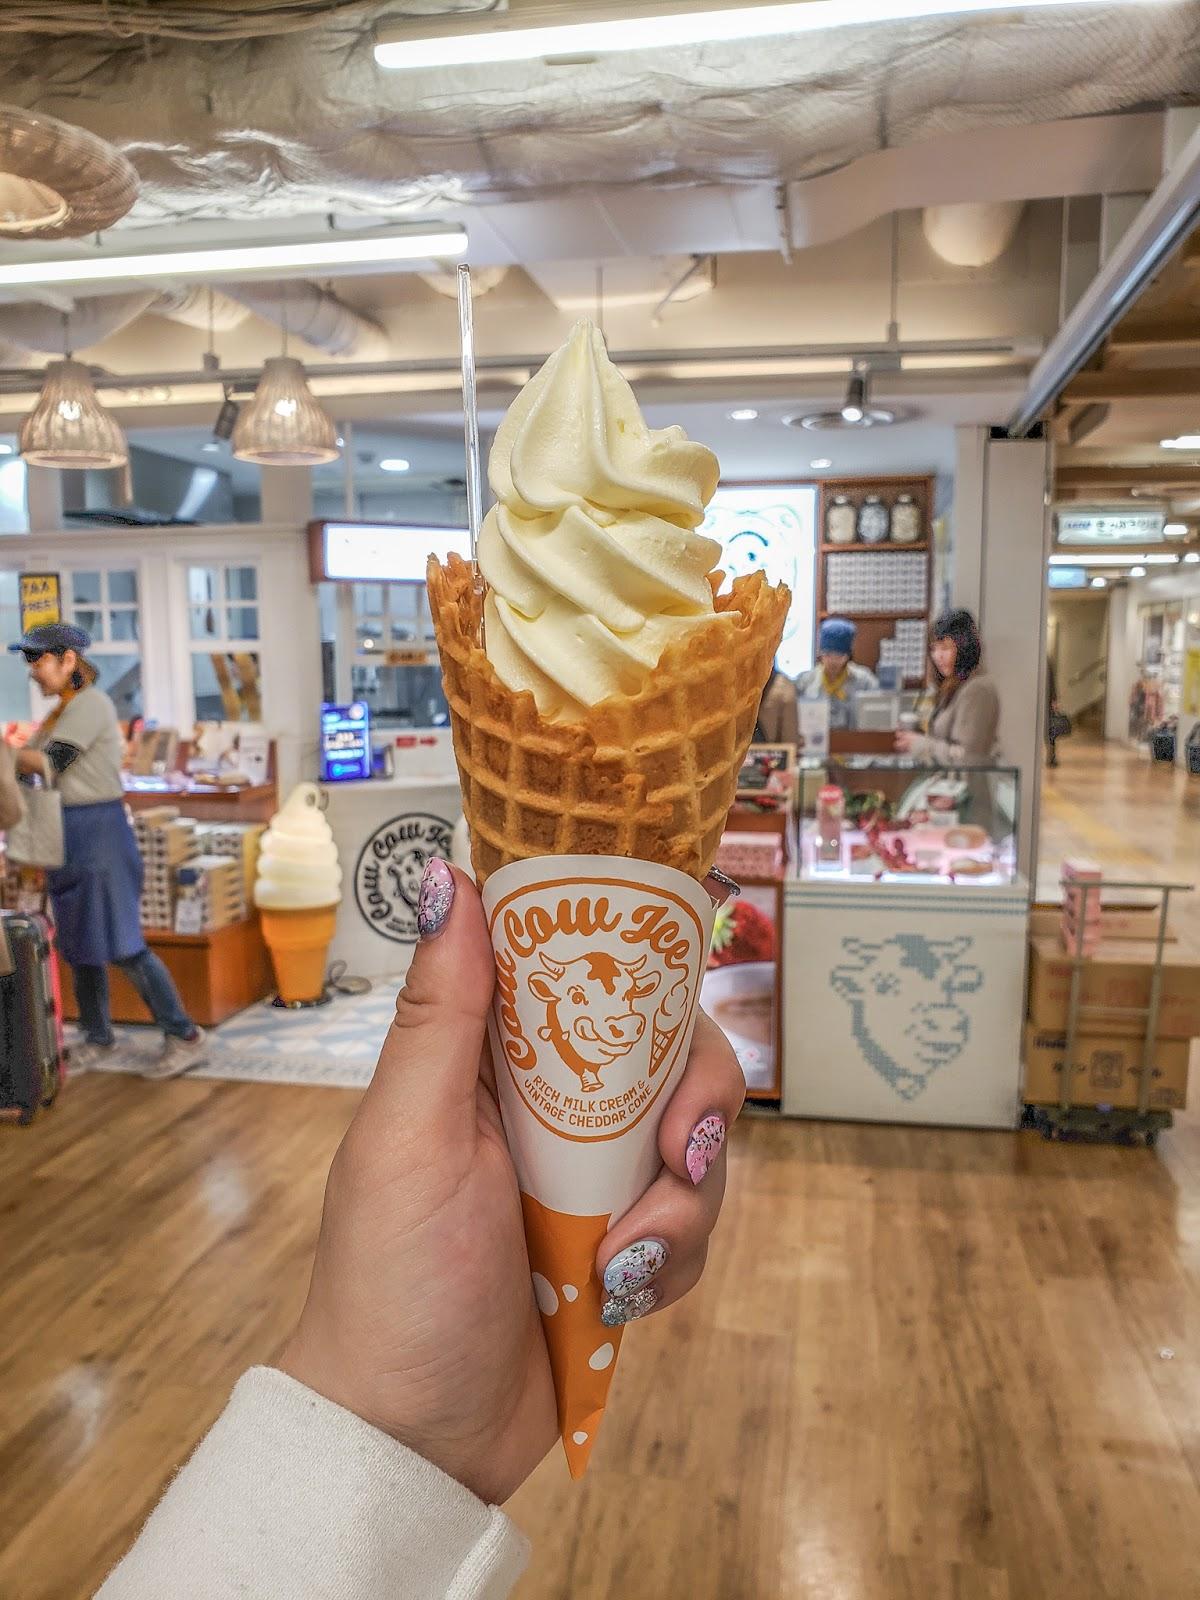 shinjuku japan food foodie cheese waffle cone hokkaido milk